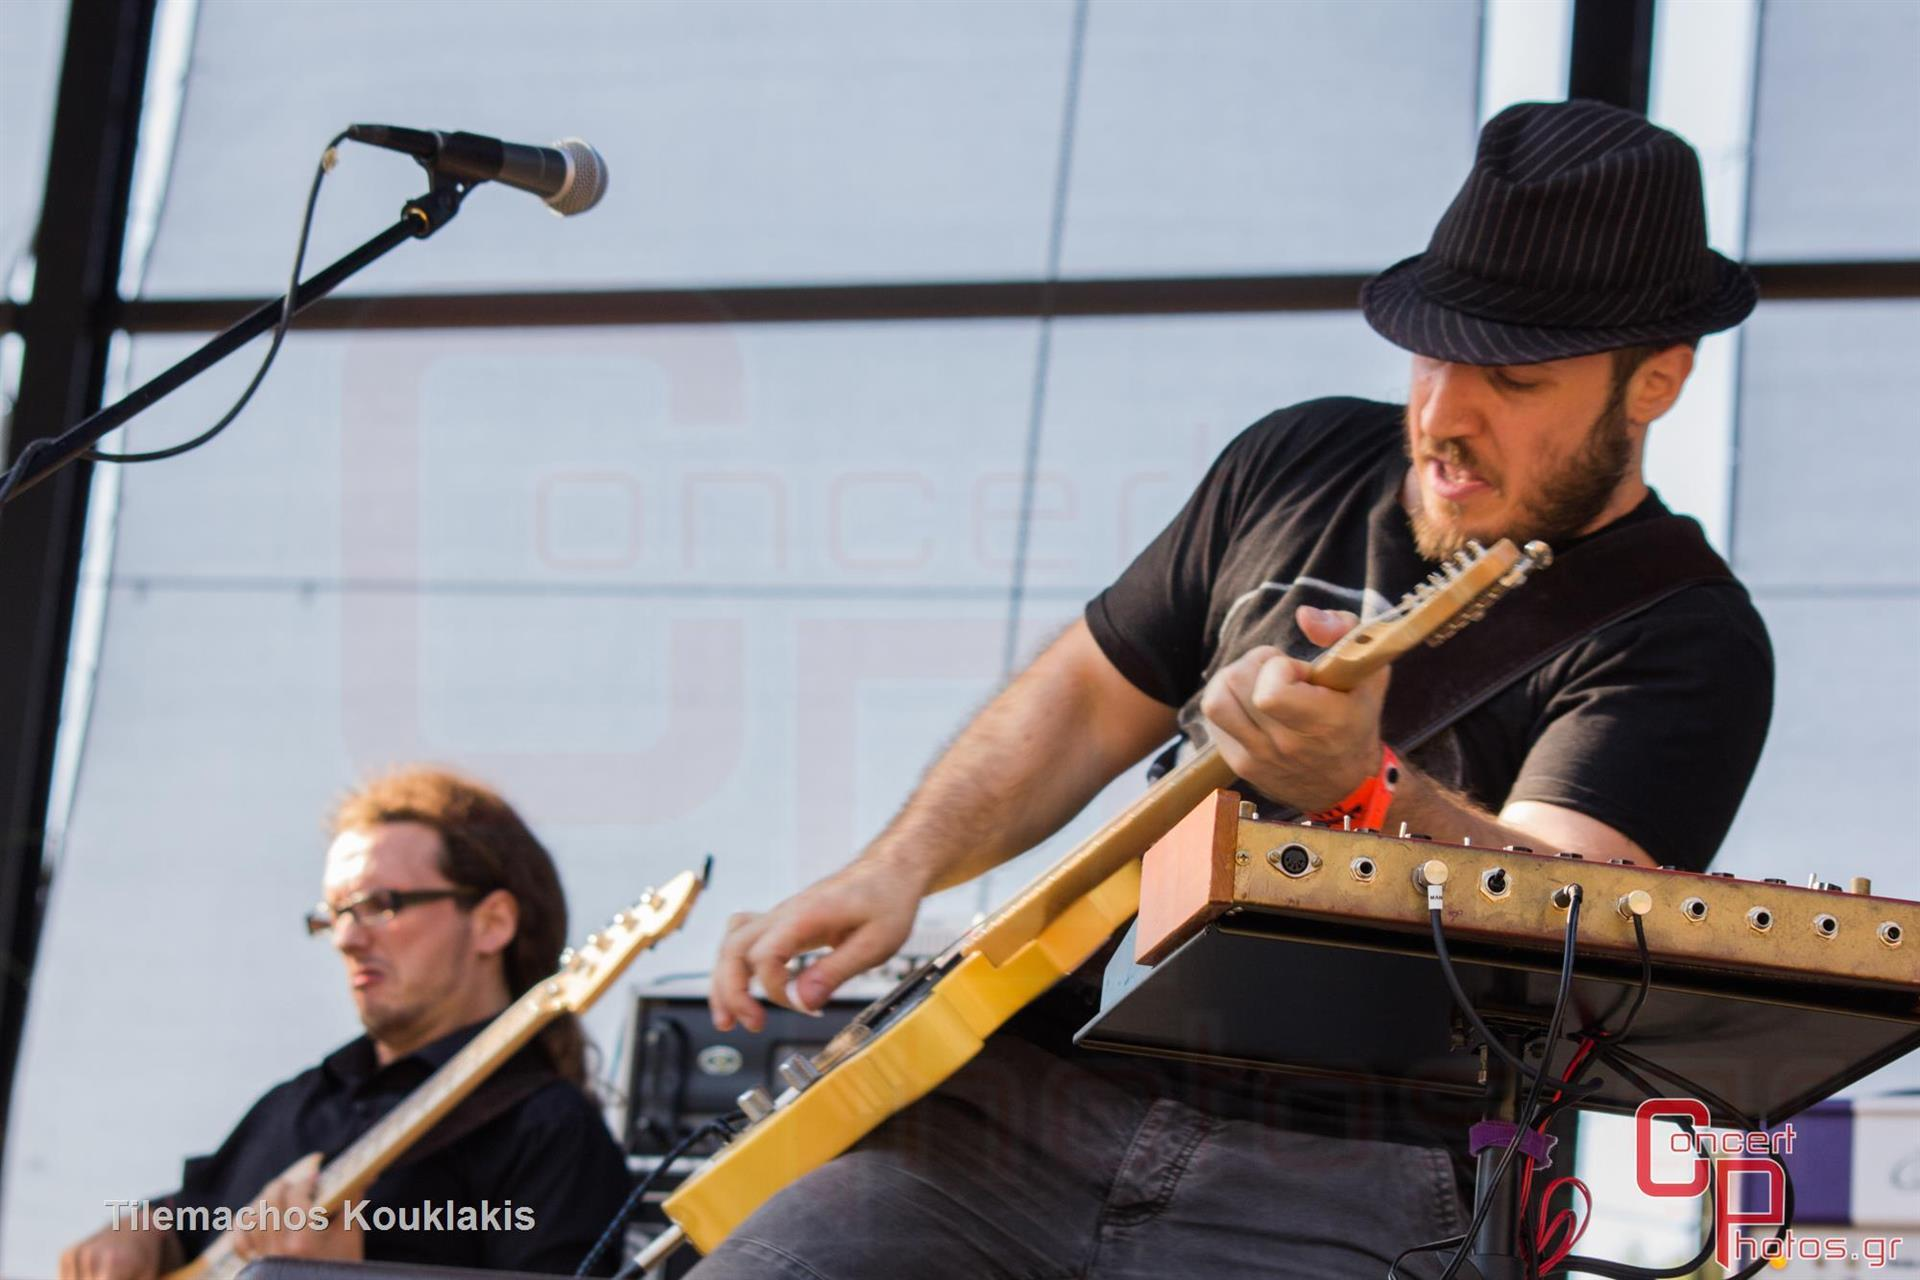 Craig Walker-Craig Walker photographer: Tilemachos Kouklakis - concertphotos_-0350